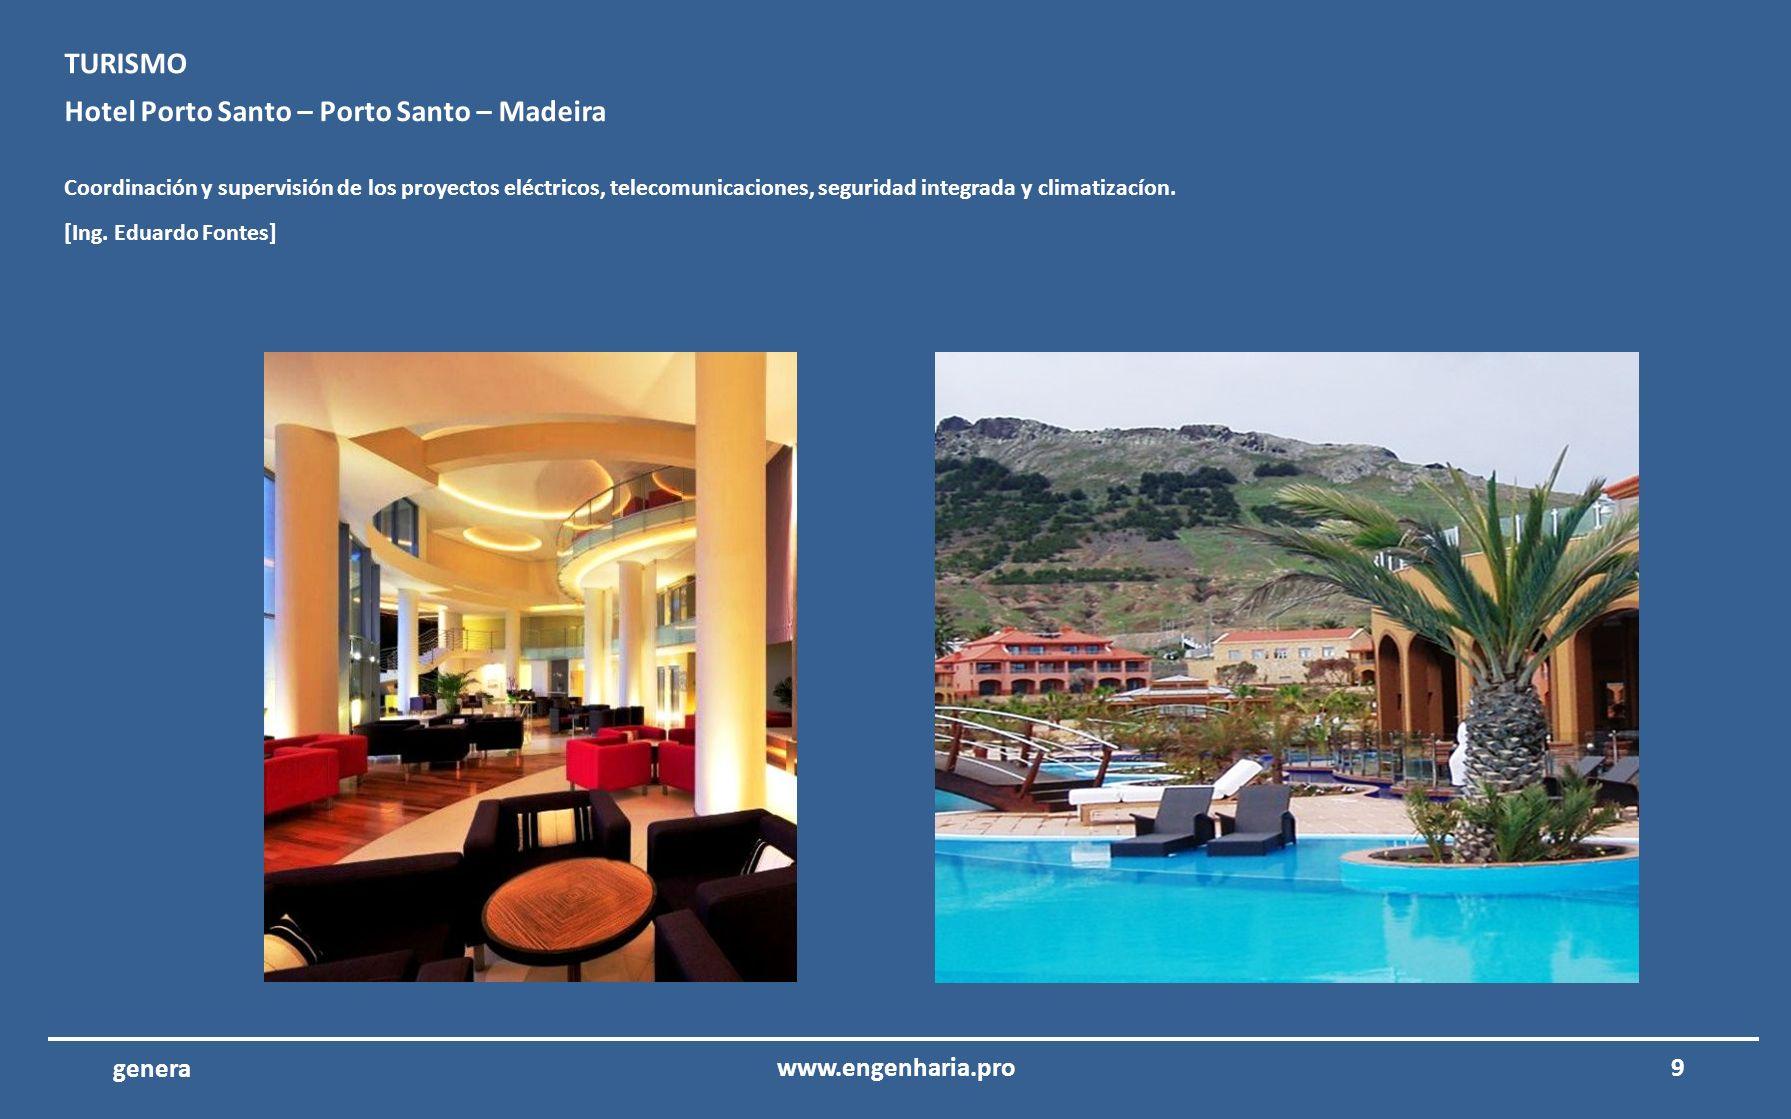 Hotel Porto Santo – Porto Santo – Madeira